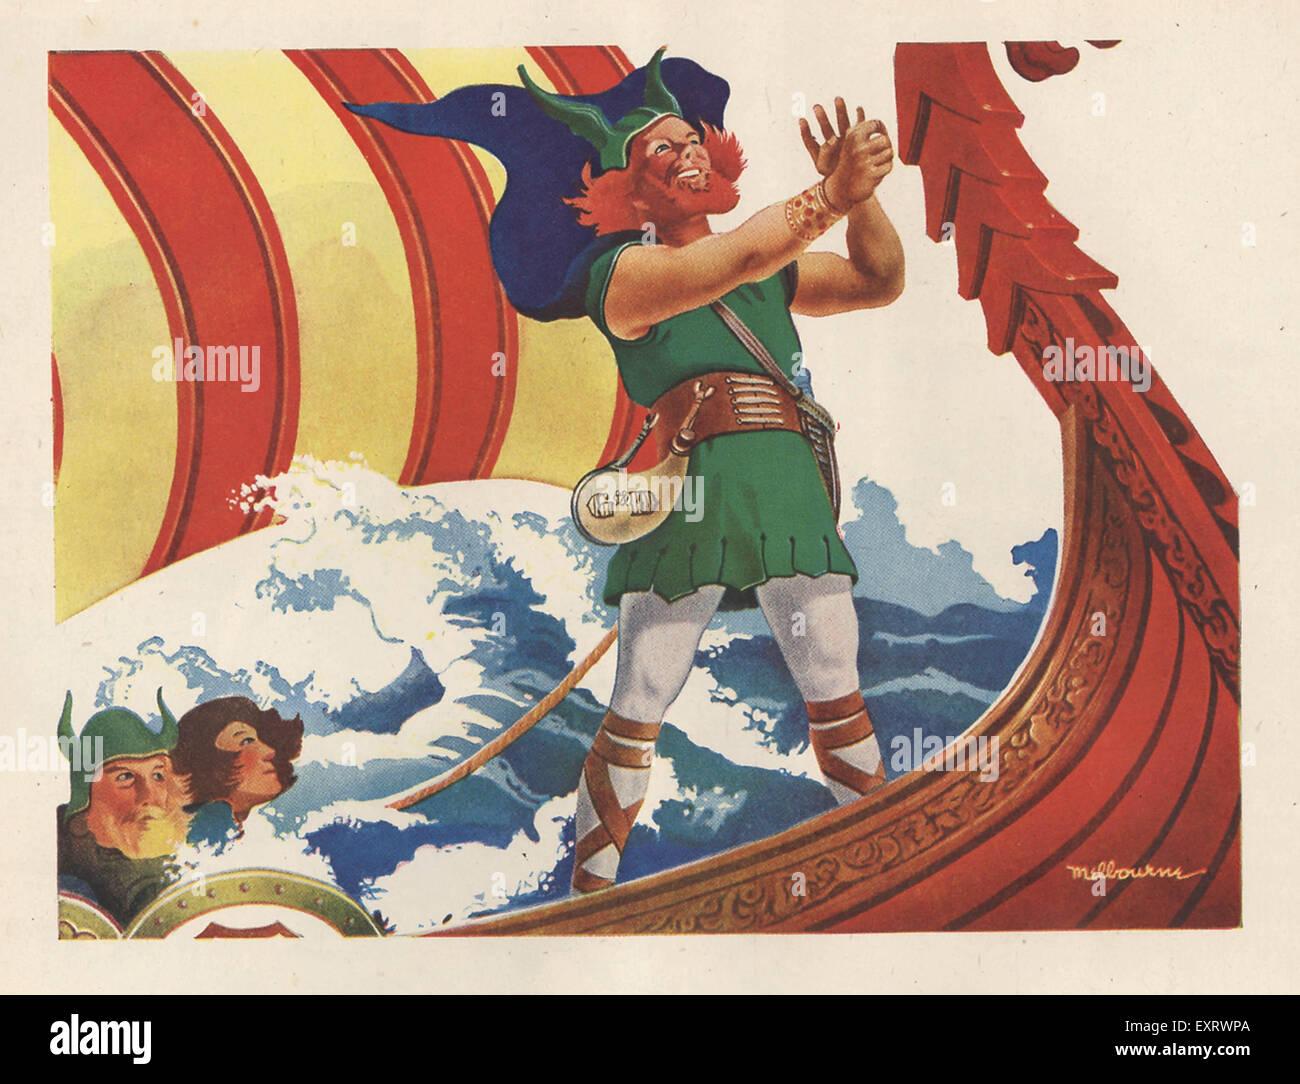 1940s USA Vikings Magazine Advert - Stock Image